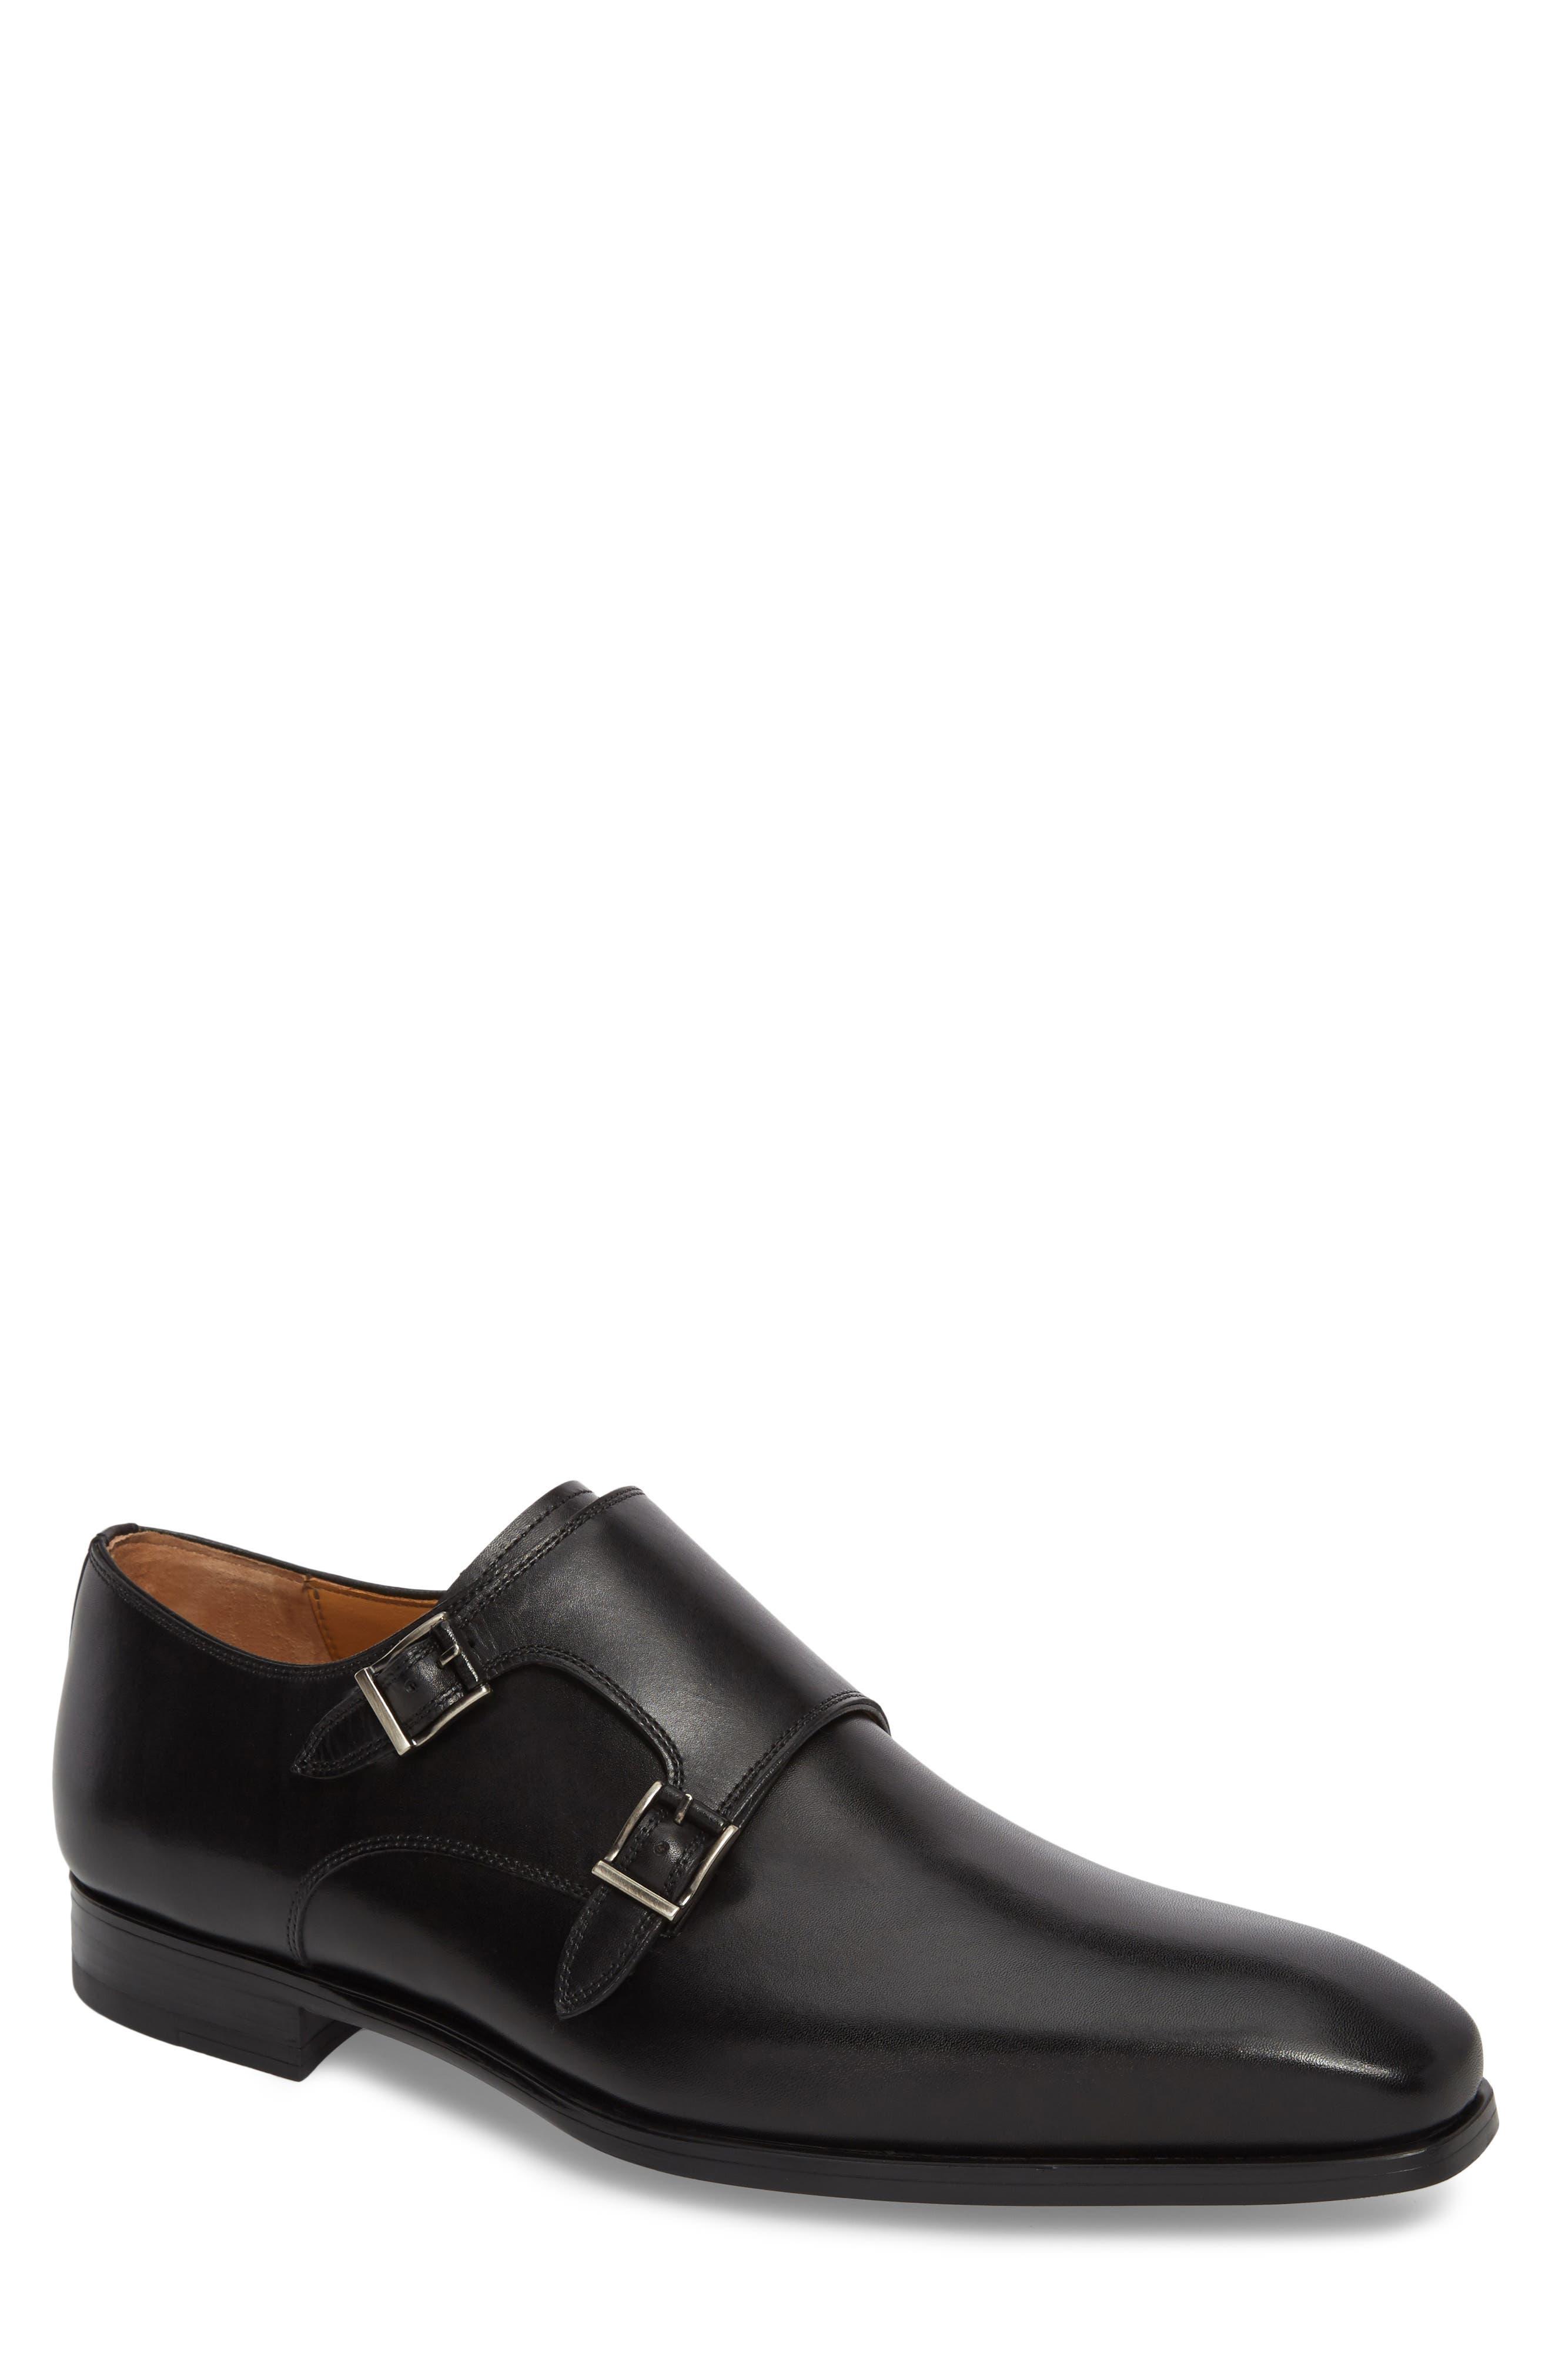 Ramolo Double Monk Strap Shoe,                         Main,                         color, Black Leather